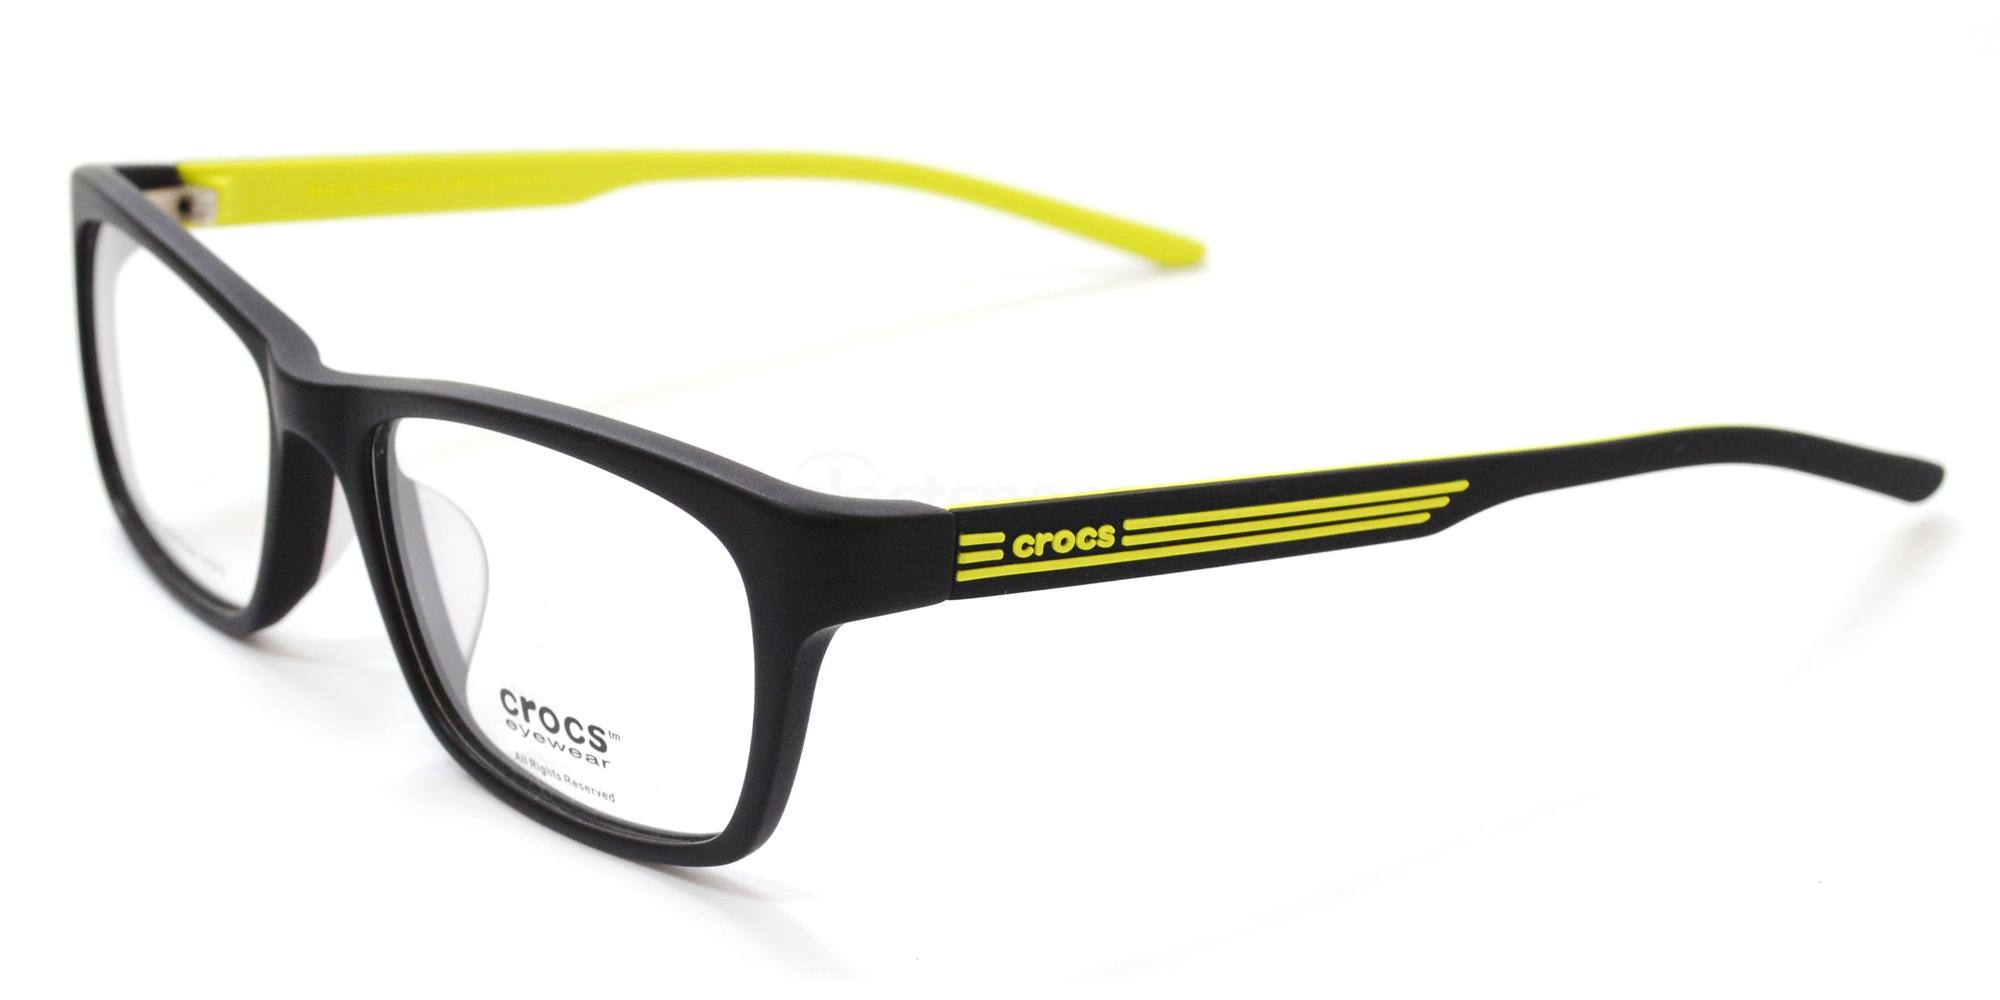 20GN CF 369 Glasses, Crocs Eyewear